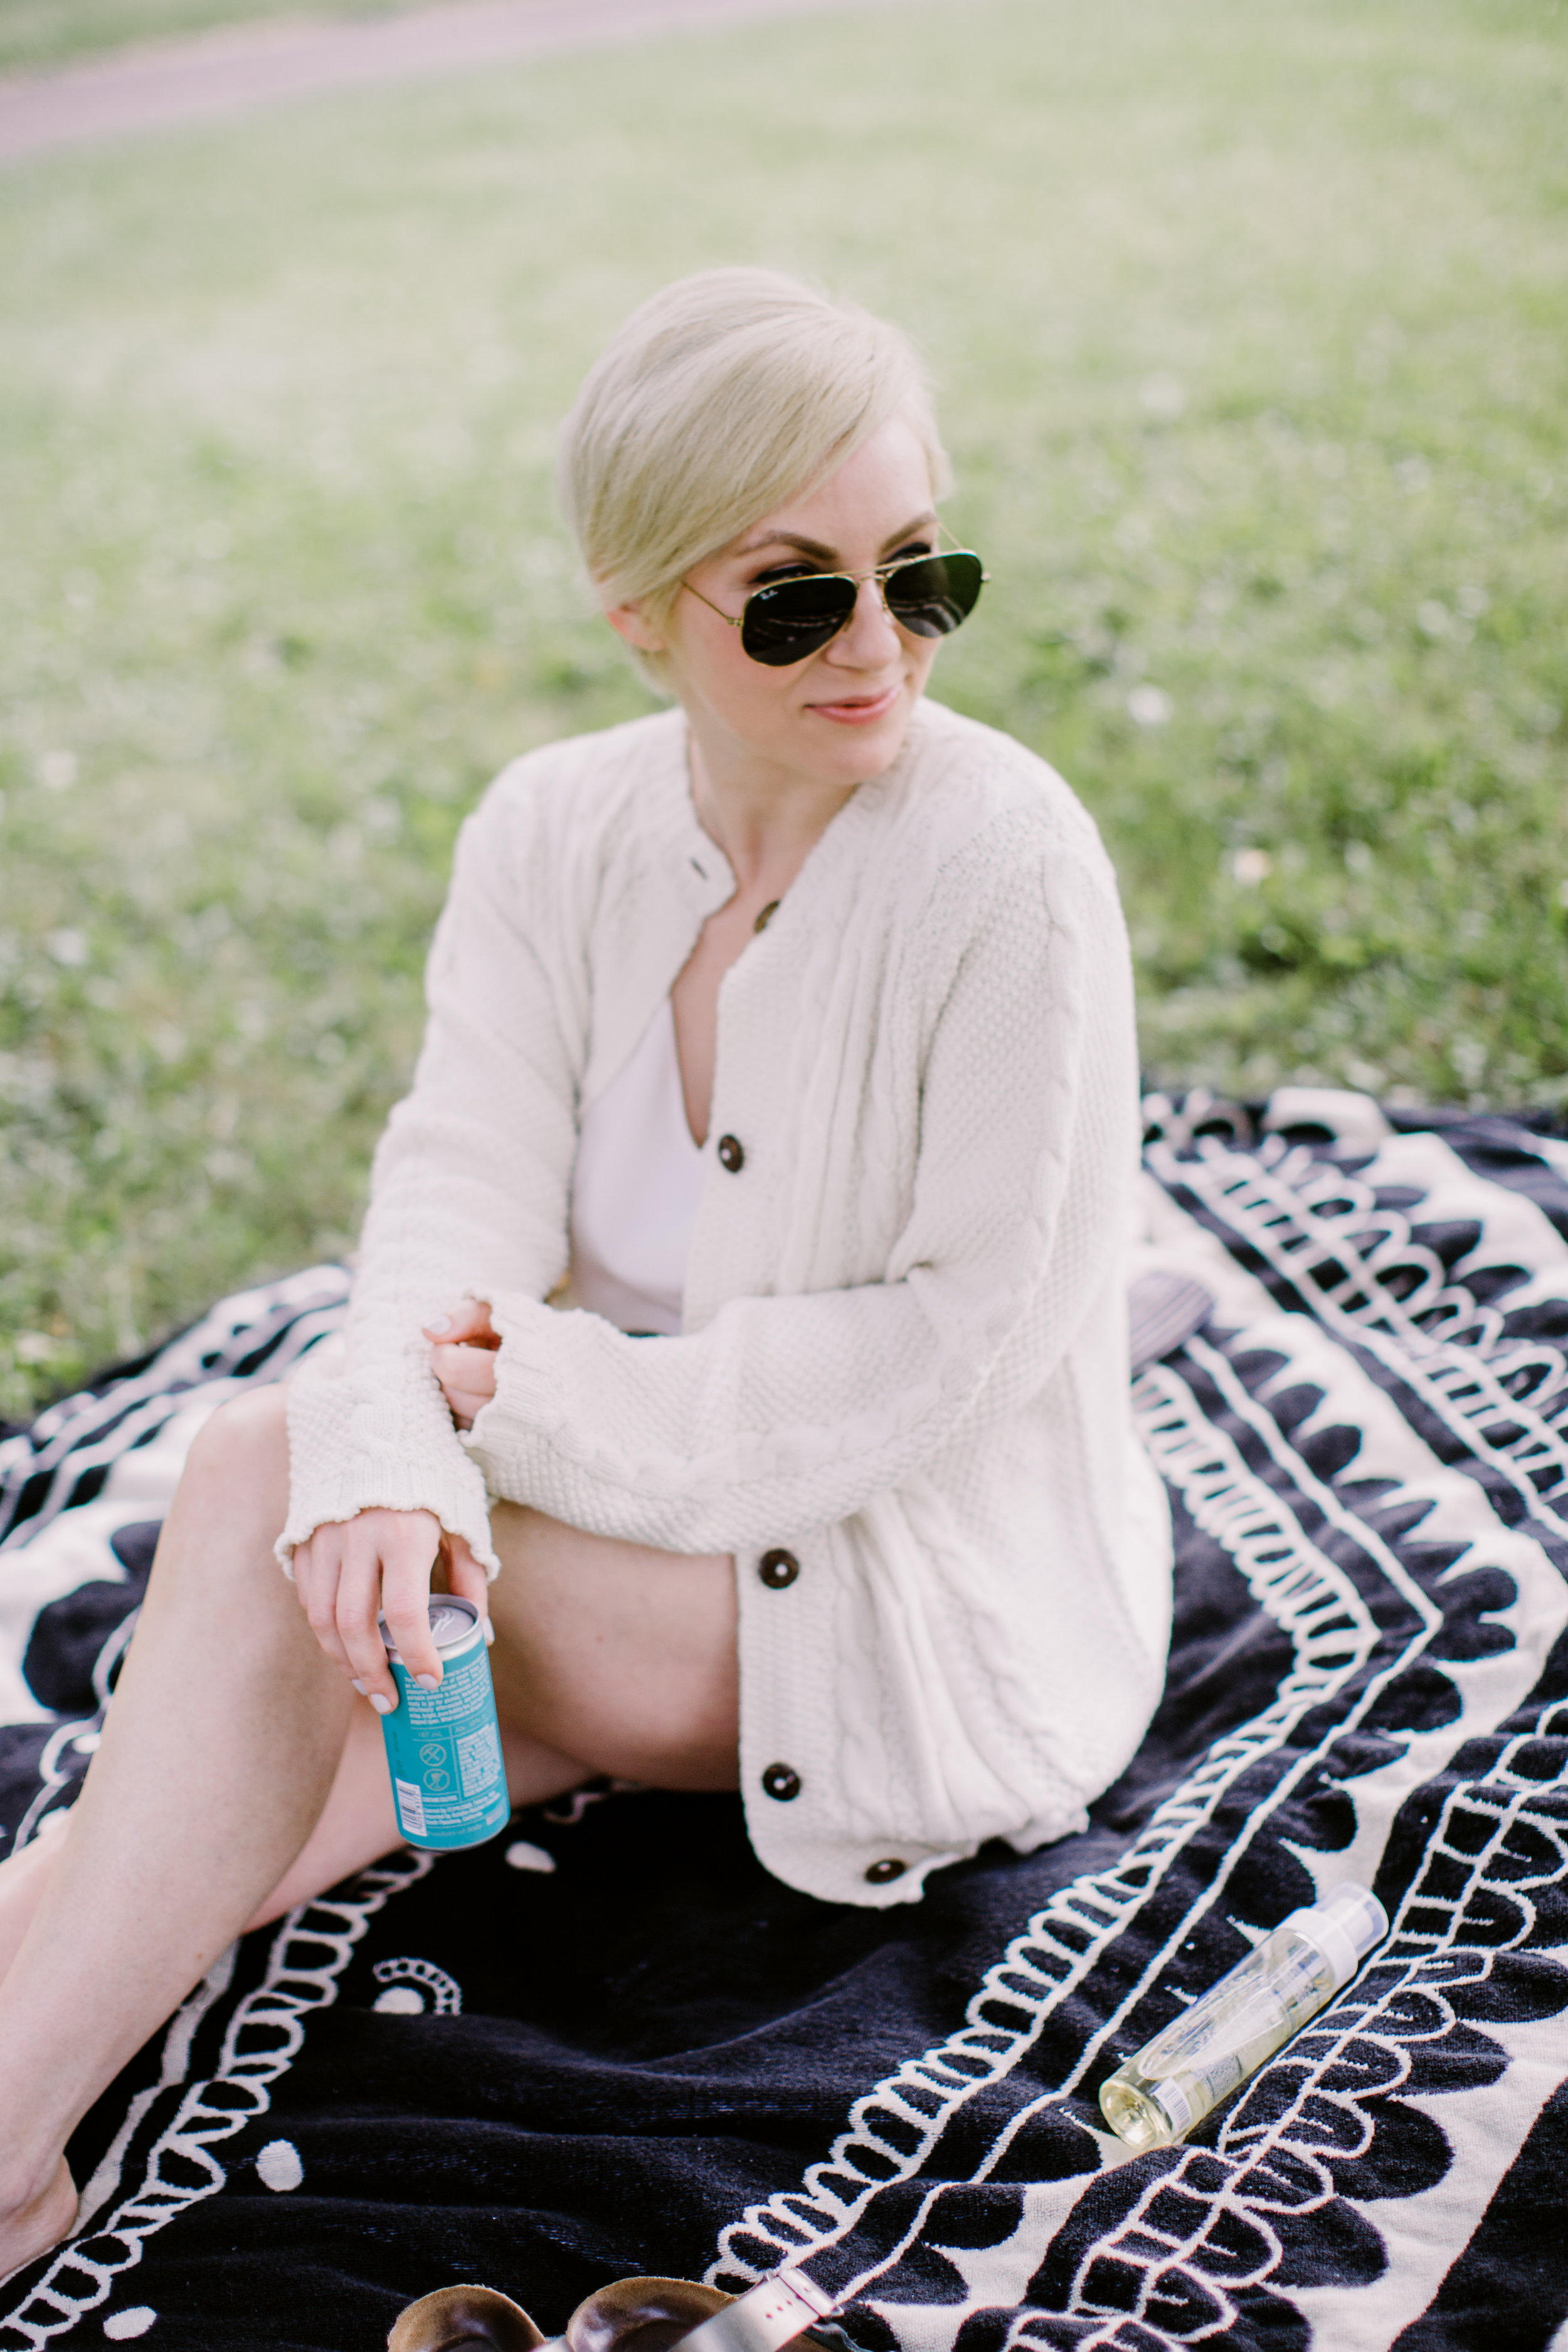 lovenothingmore-pittsburghblogger-woolenmill-rayban-birkenstocks